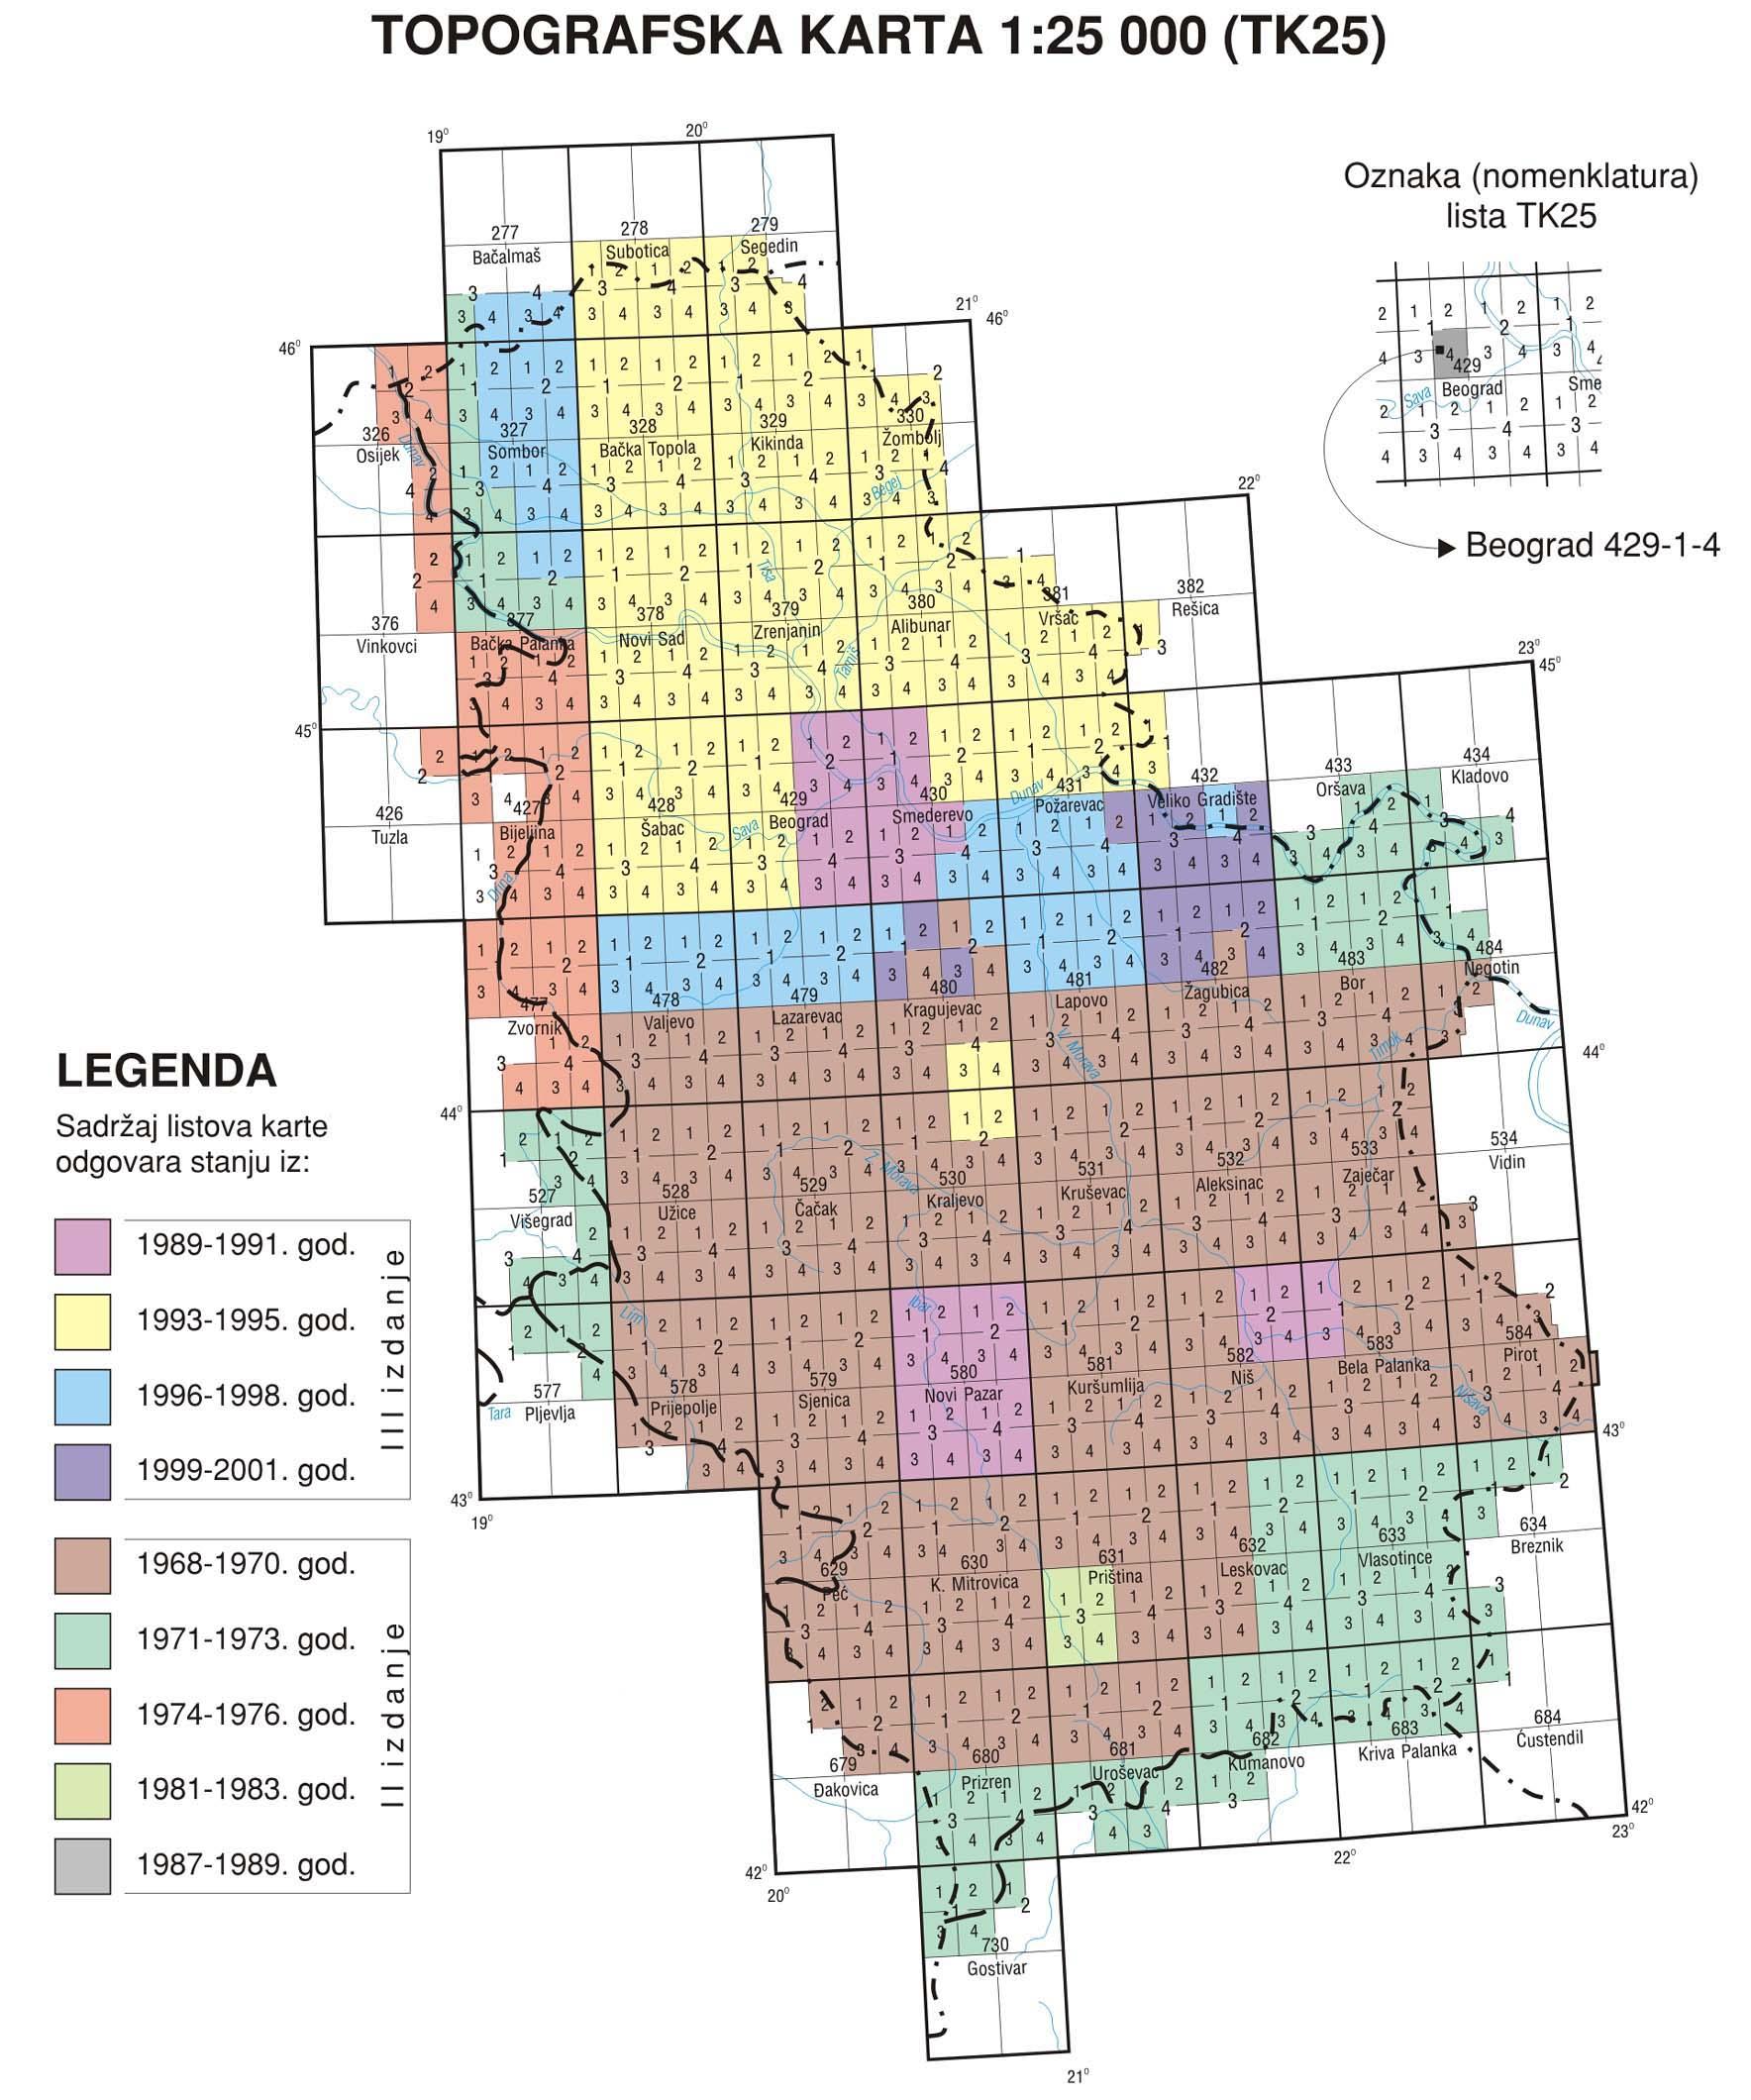 Topografska Karta 1 25 000 Tk25 Ii Tk25 Iii Drugo I Trece